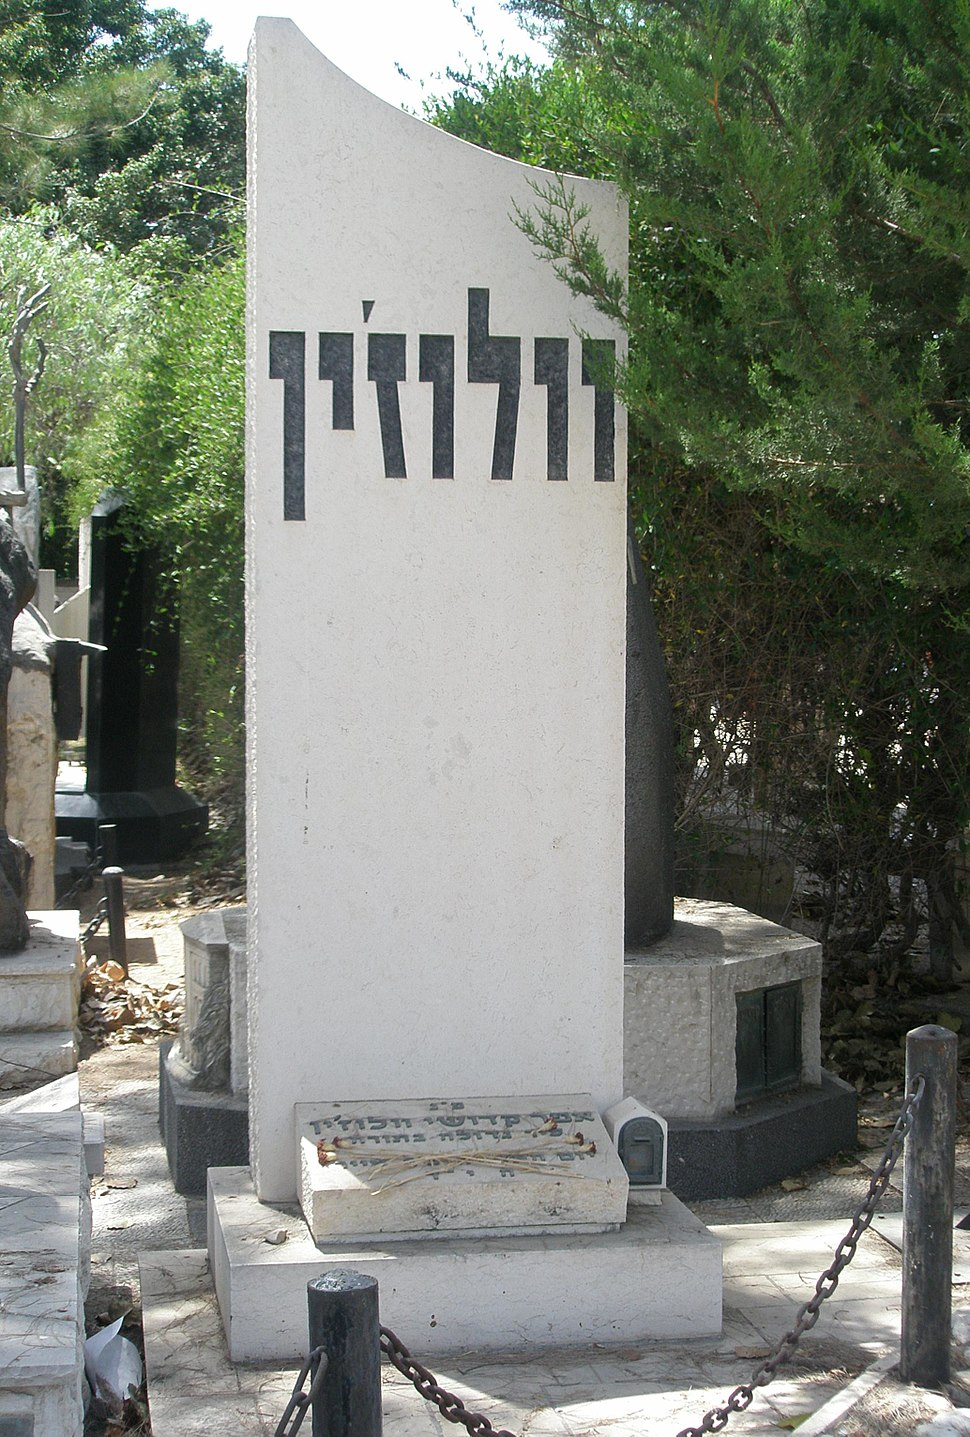 Valozhyn memorial